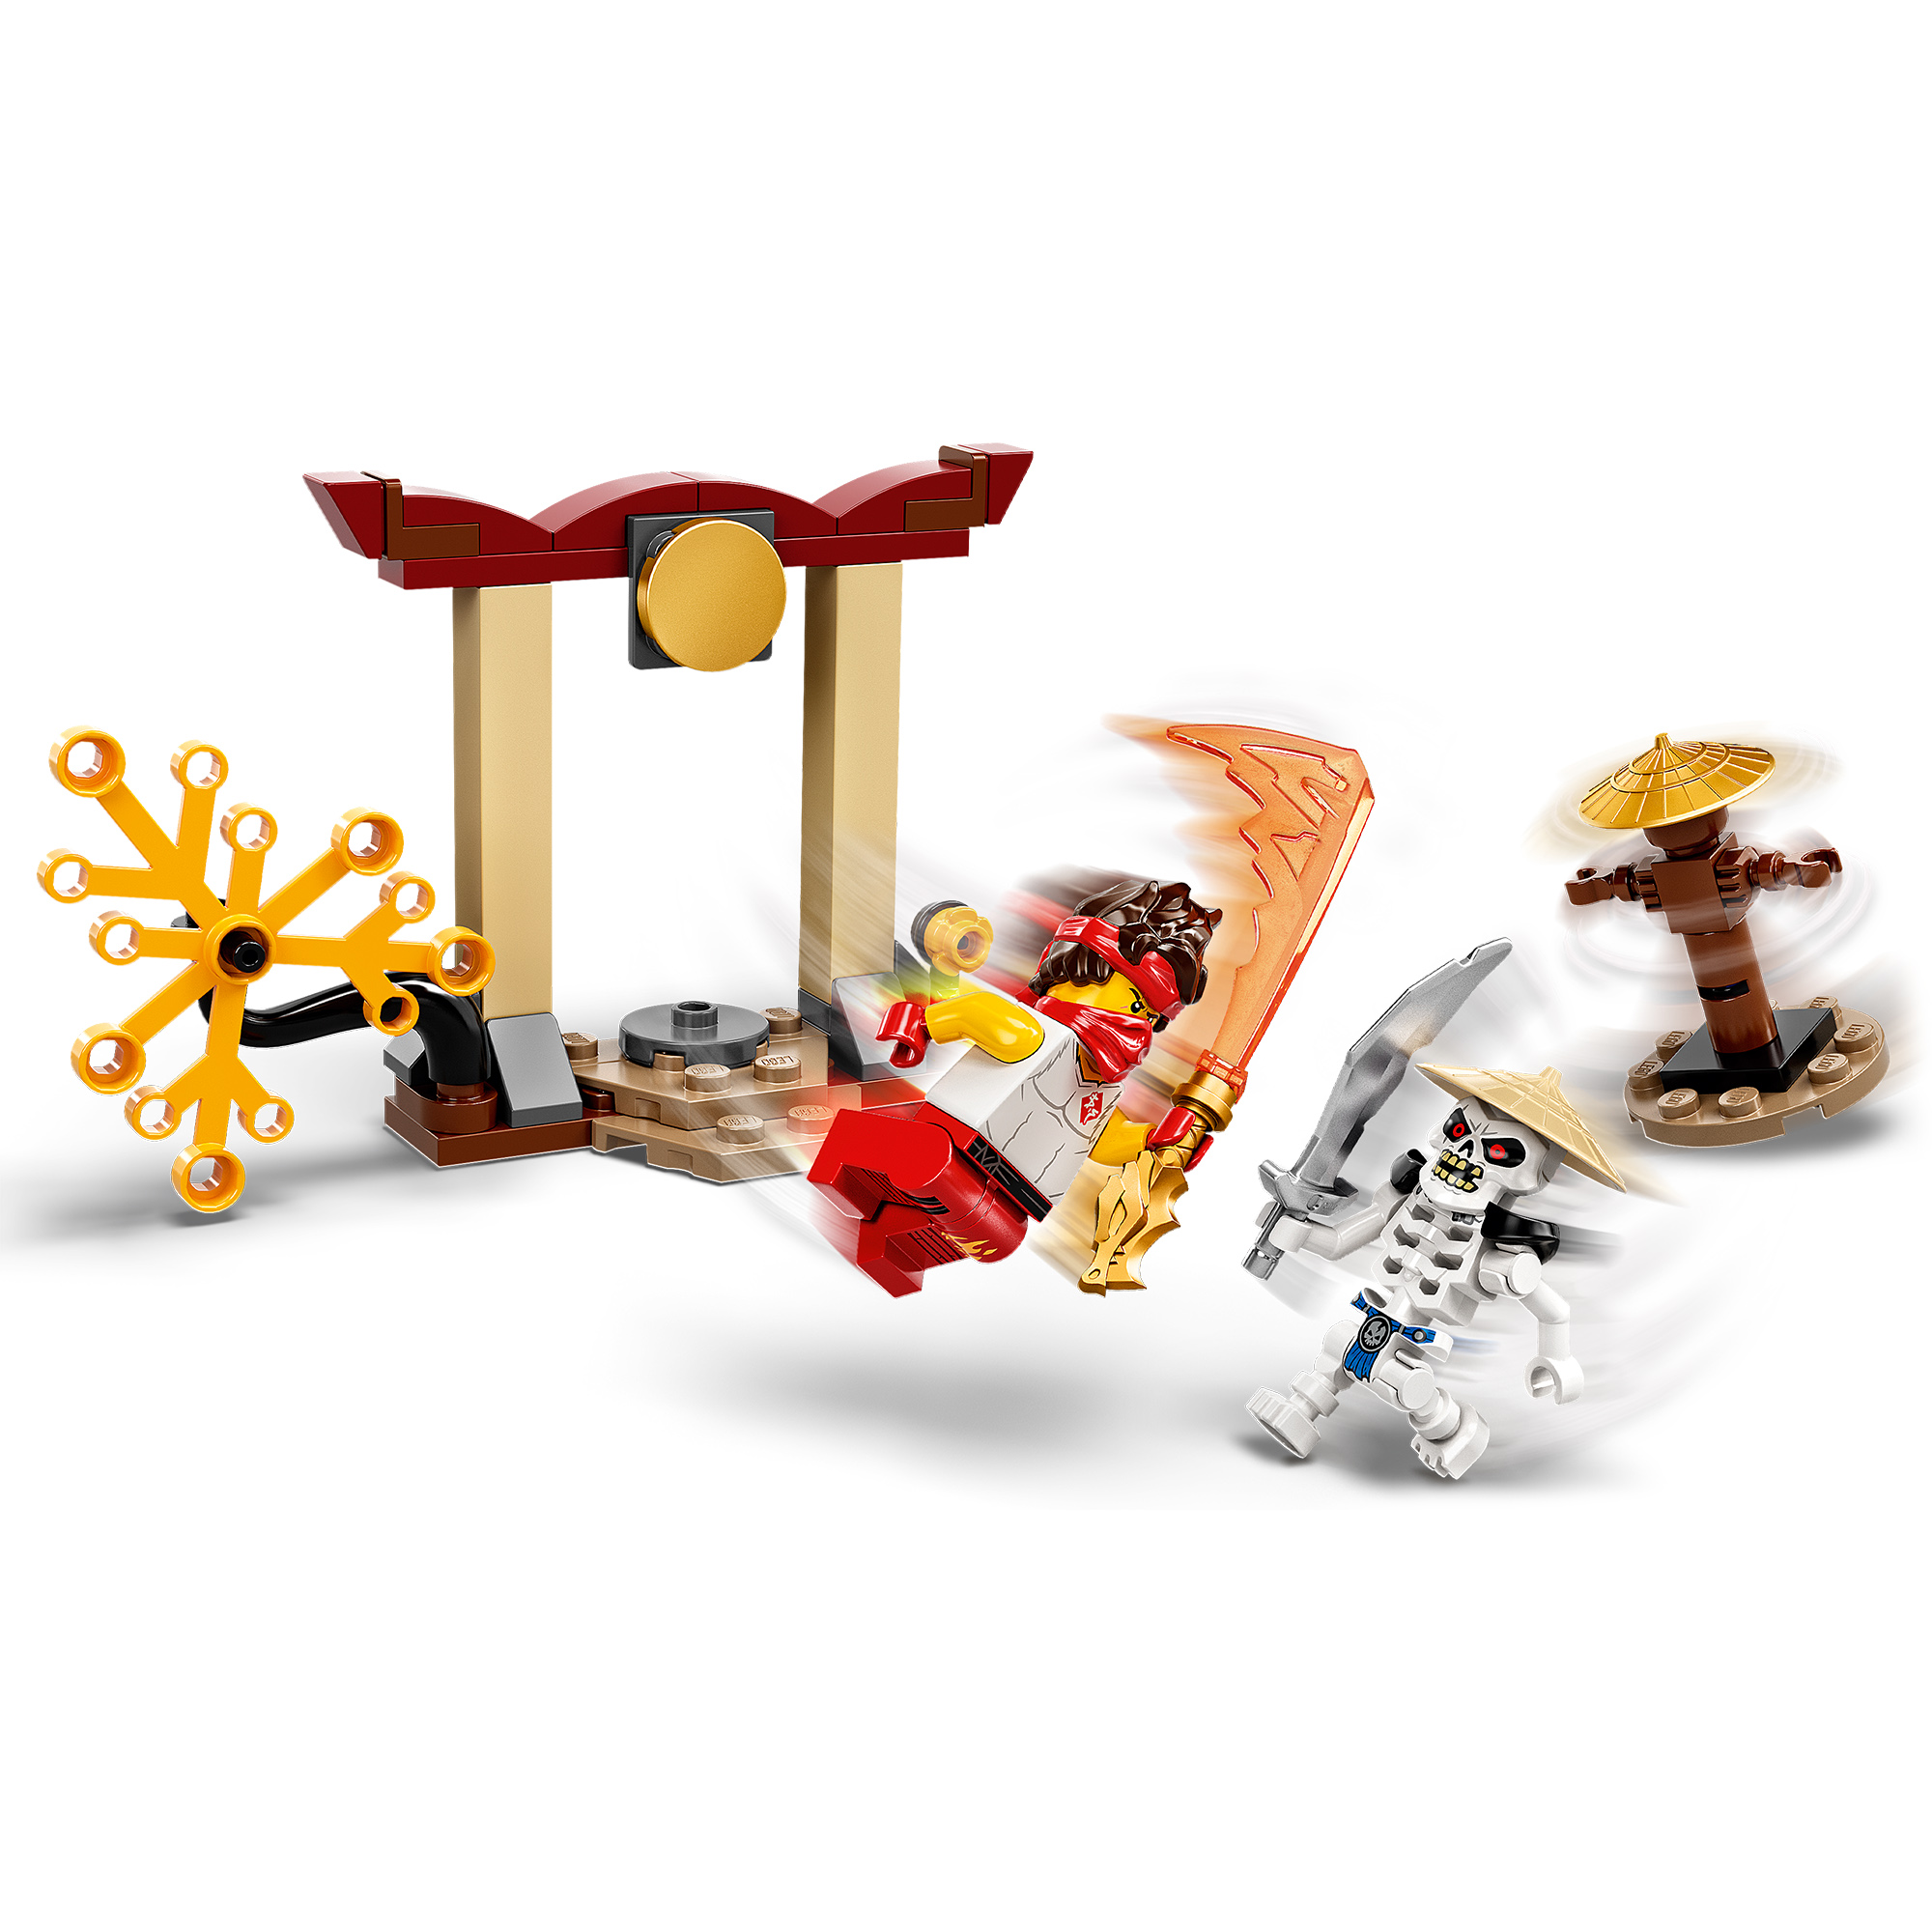 Lego ninjago battaglia epica - kai vs skulkin - 71730 - LEGO NINJAGO, Ninjago